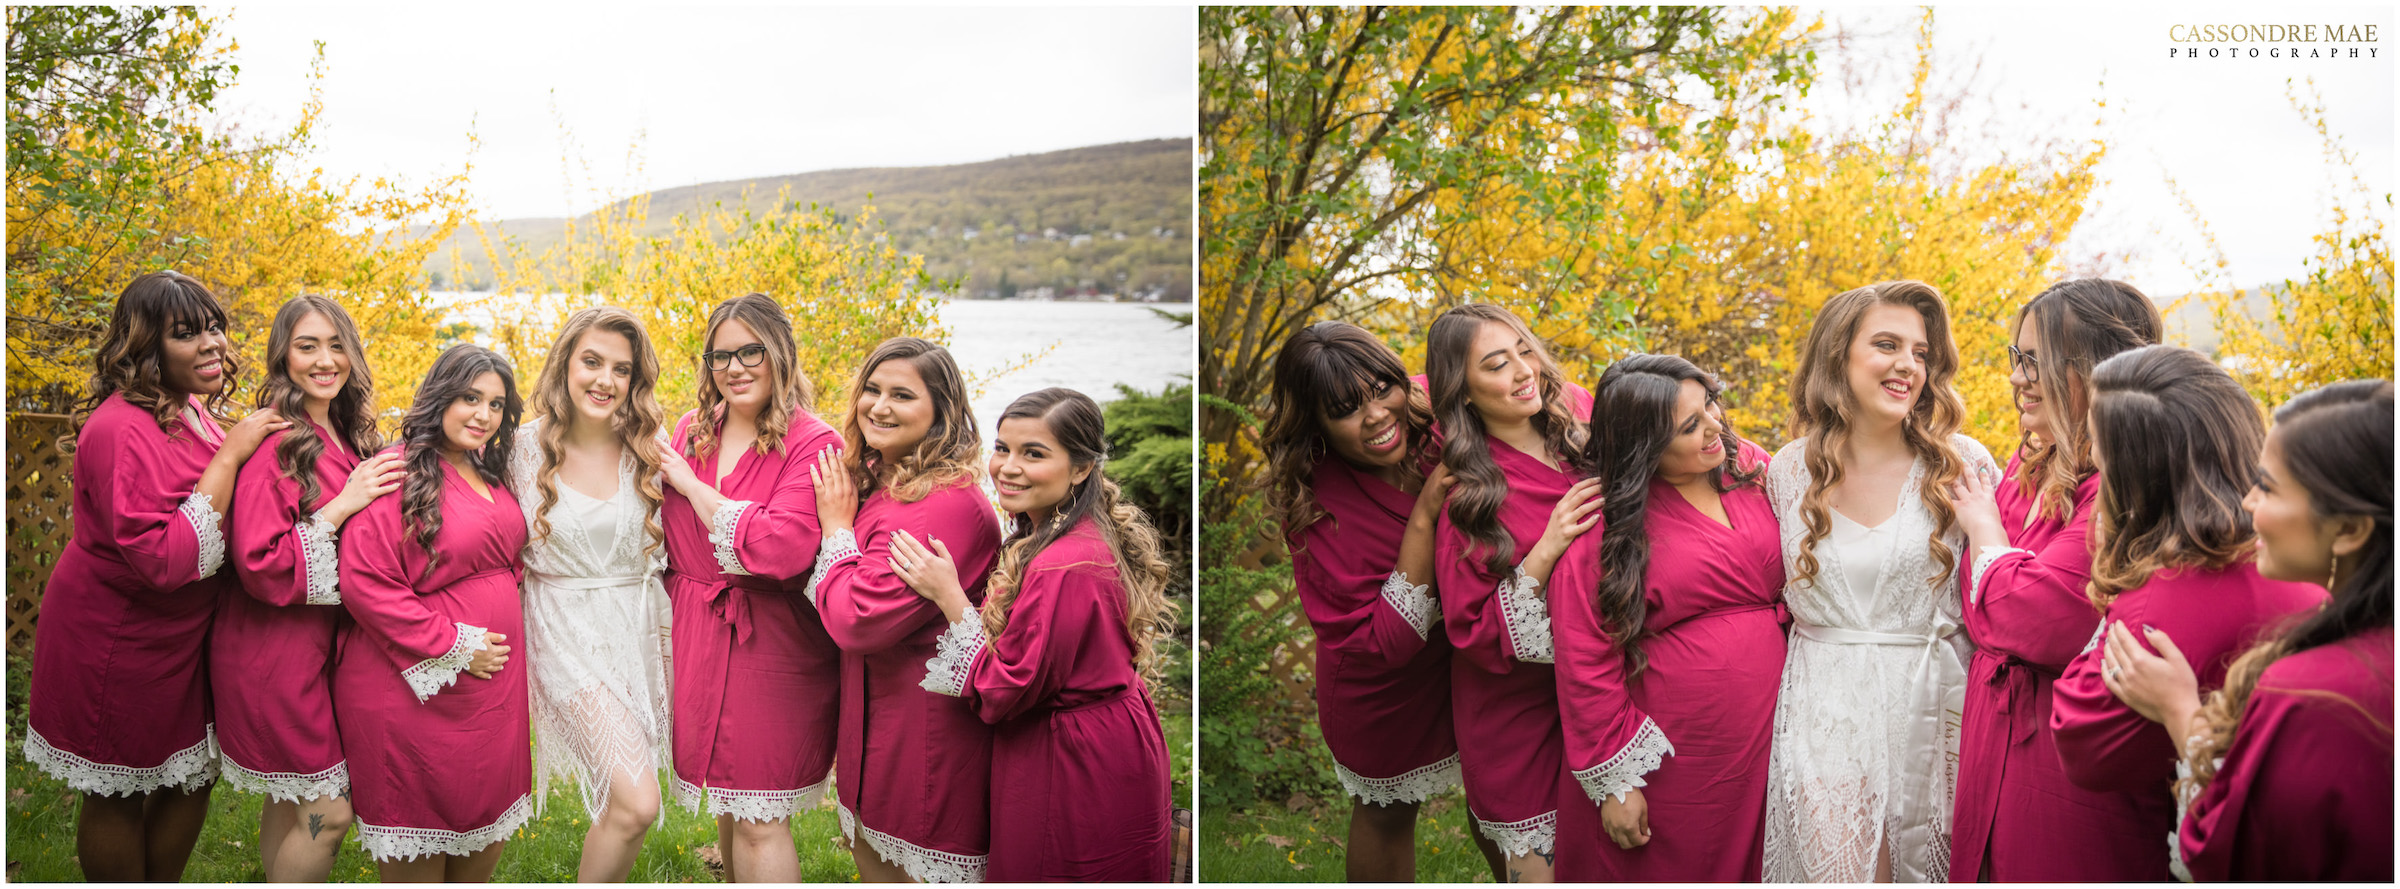 Cassondre Mae Photography Cove Castle Weddings 14.jpg